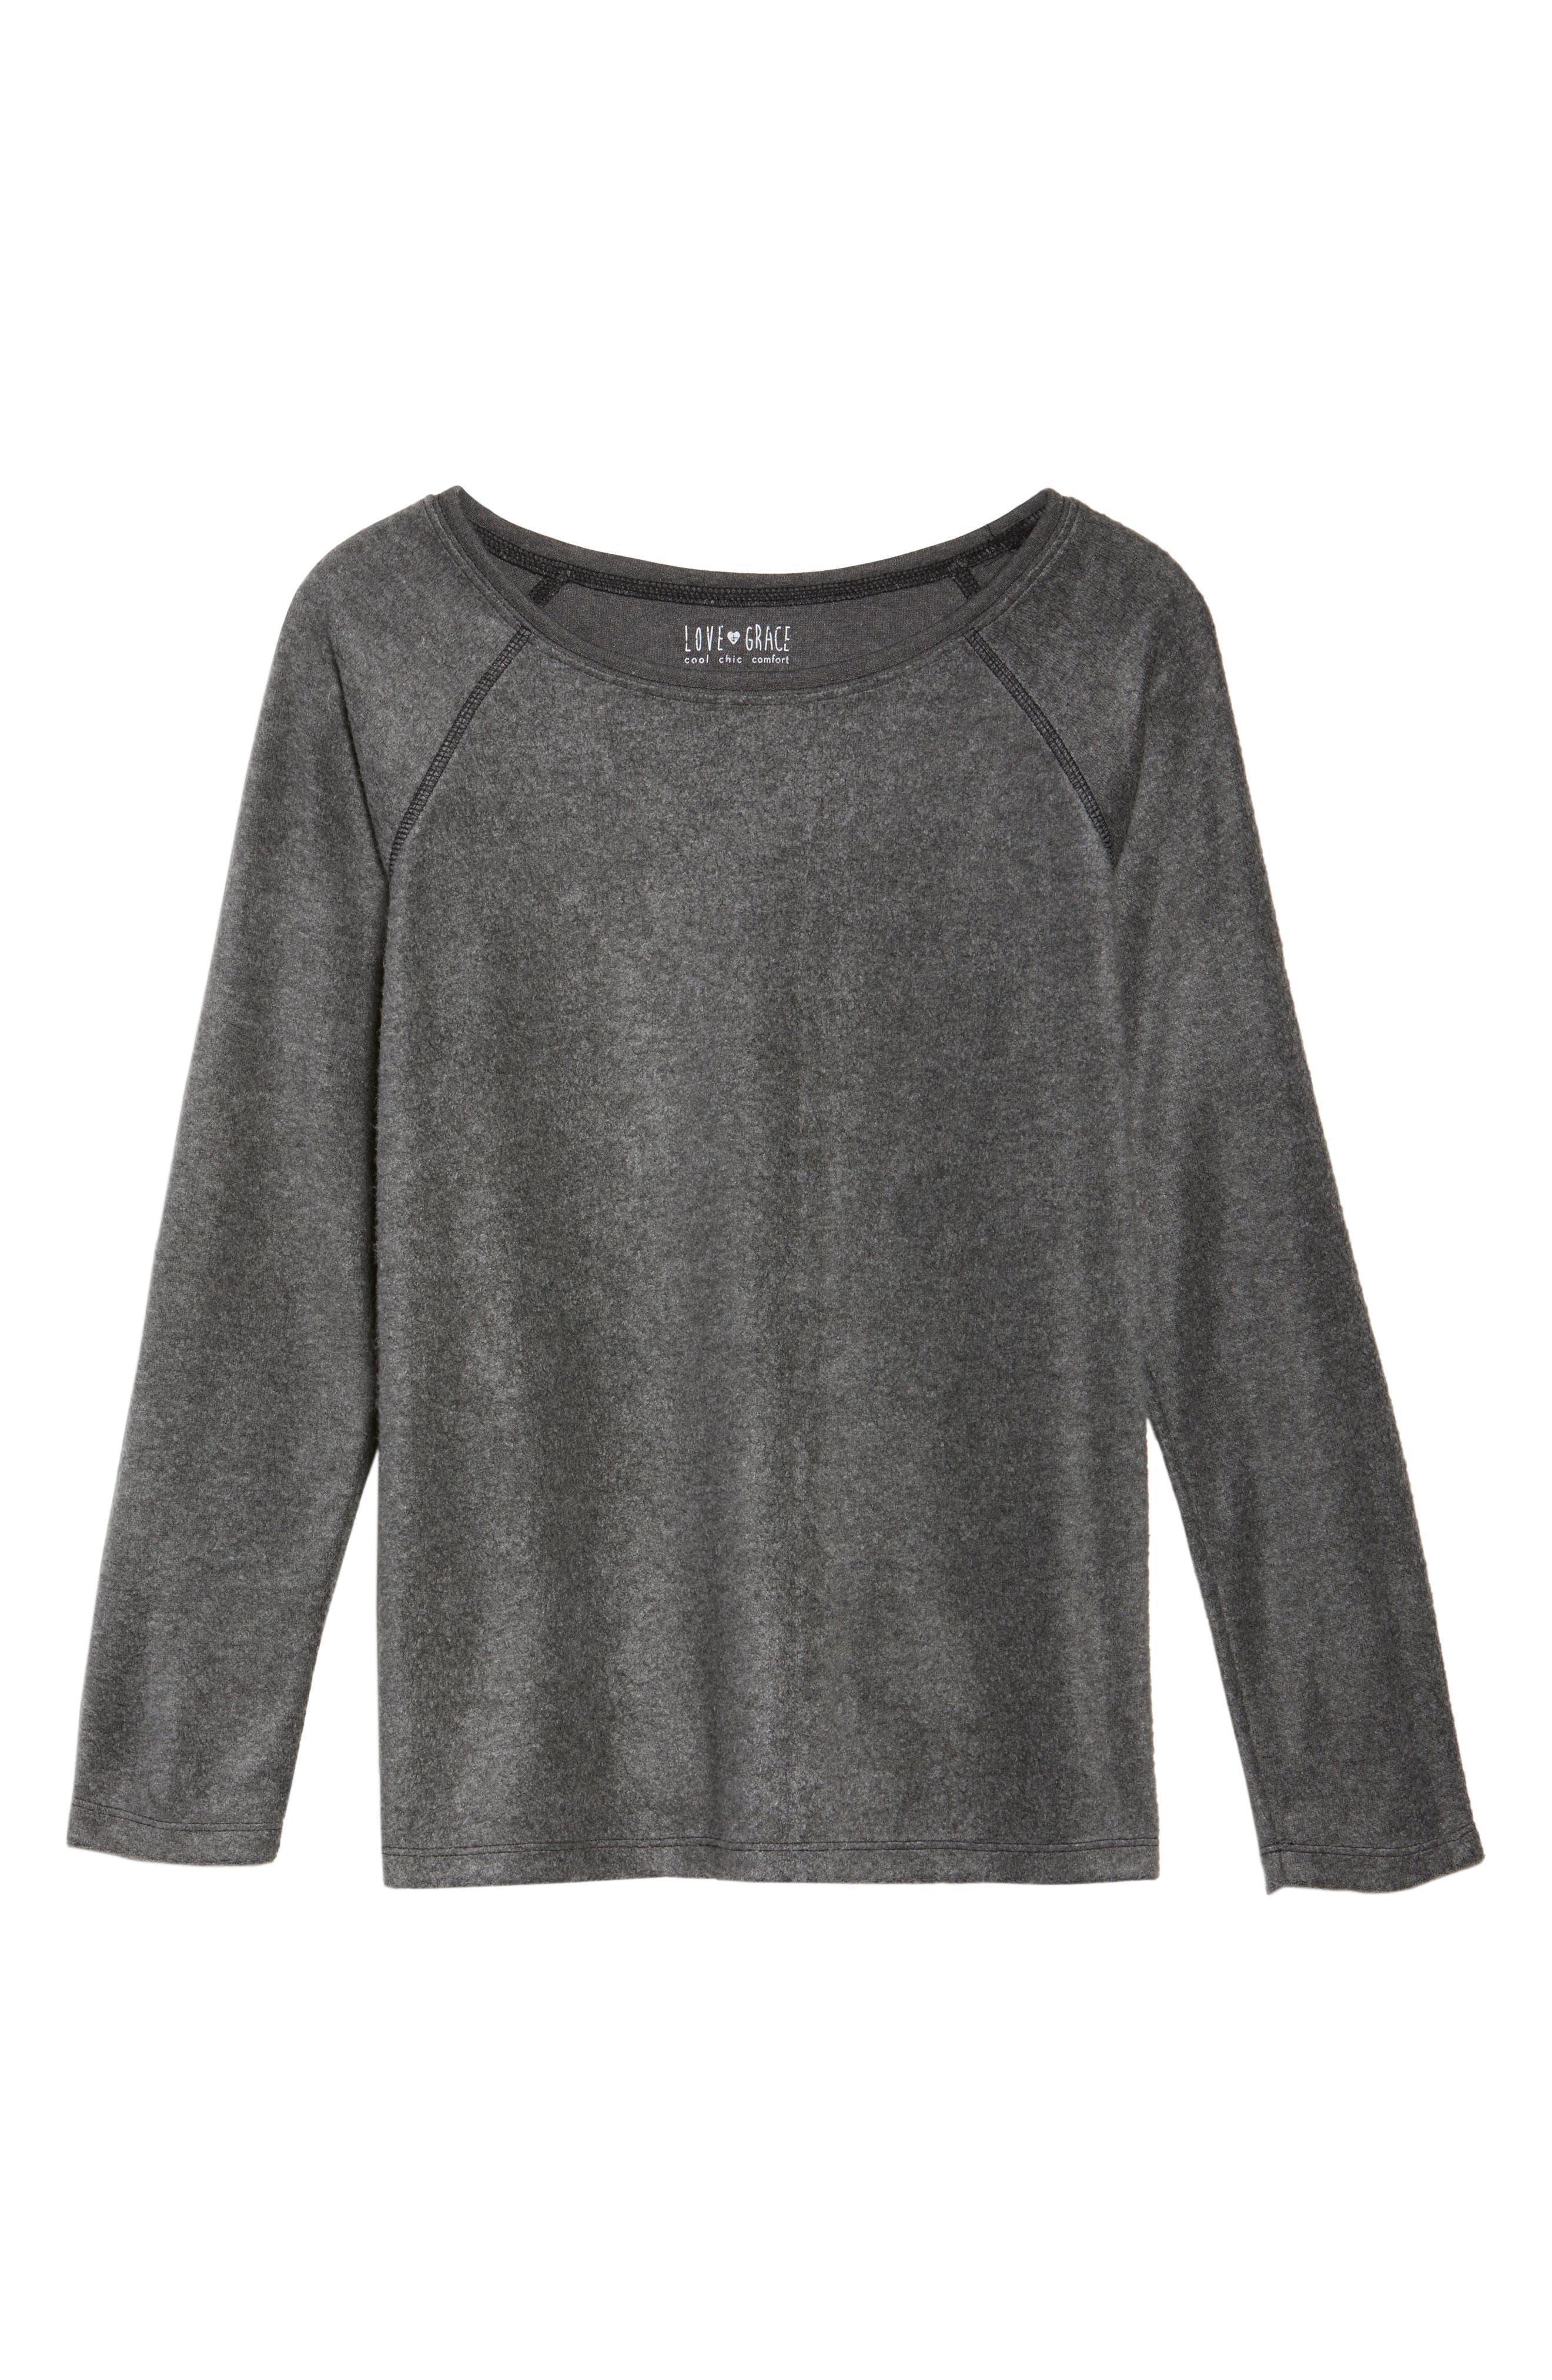 Gena Fleece Sweatshirt,                             Alternate thumbnail 6, color,                             020